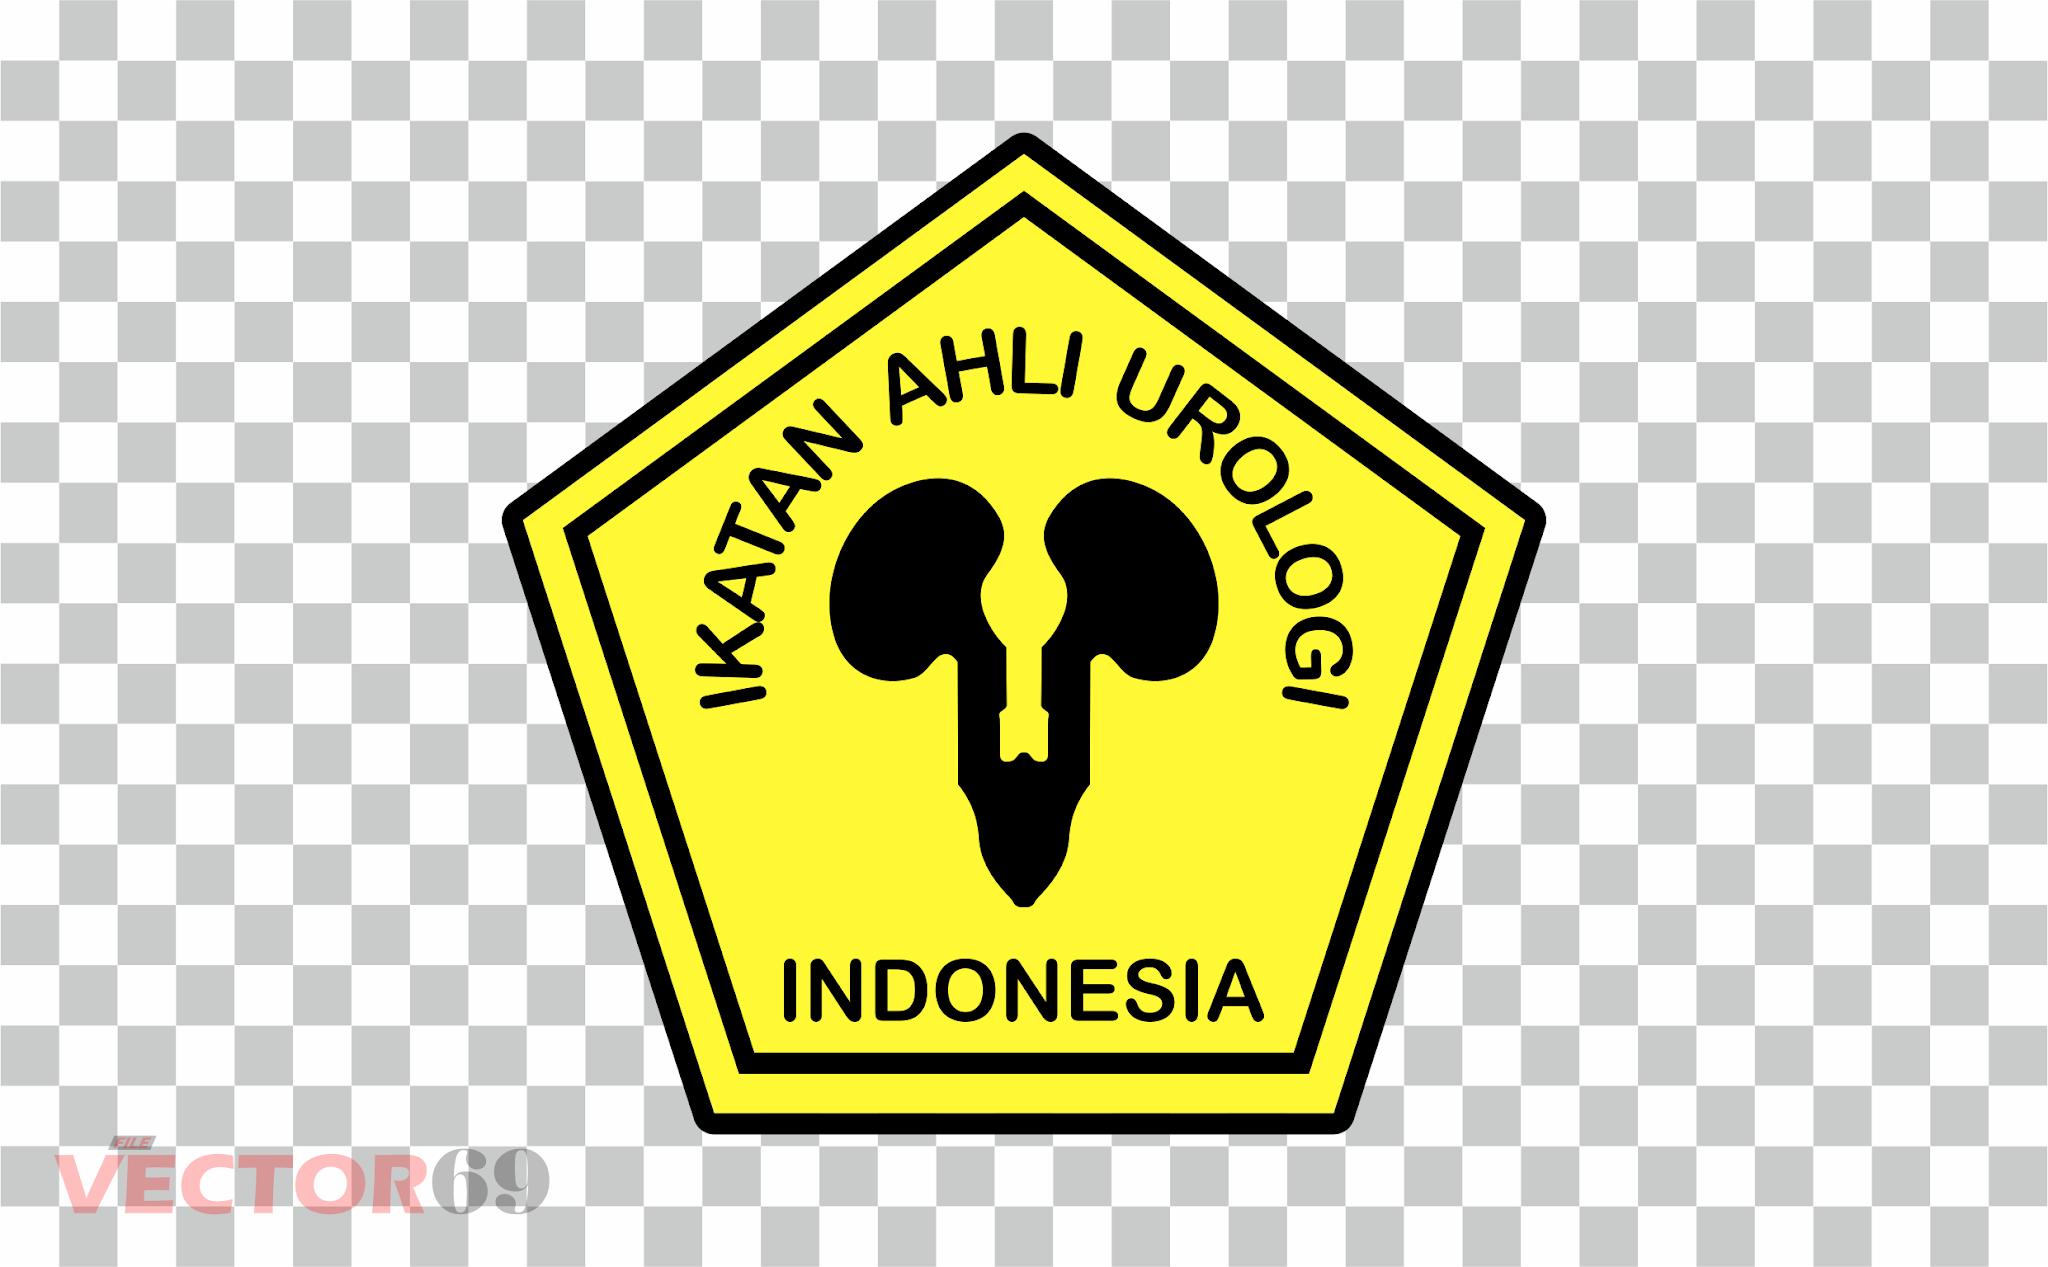 IAUI (Ikatan Ahli Urologi Indonesia) Logo - Download Vector File PNG (Portable Network Graphics)